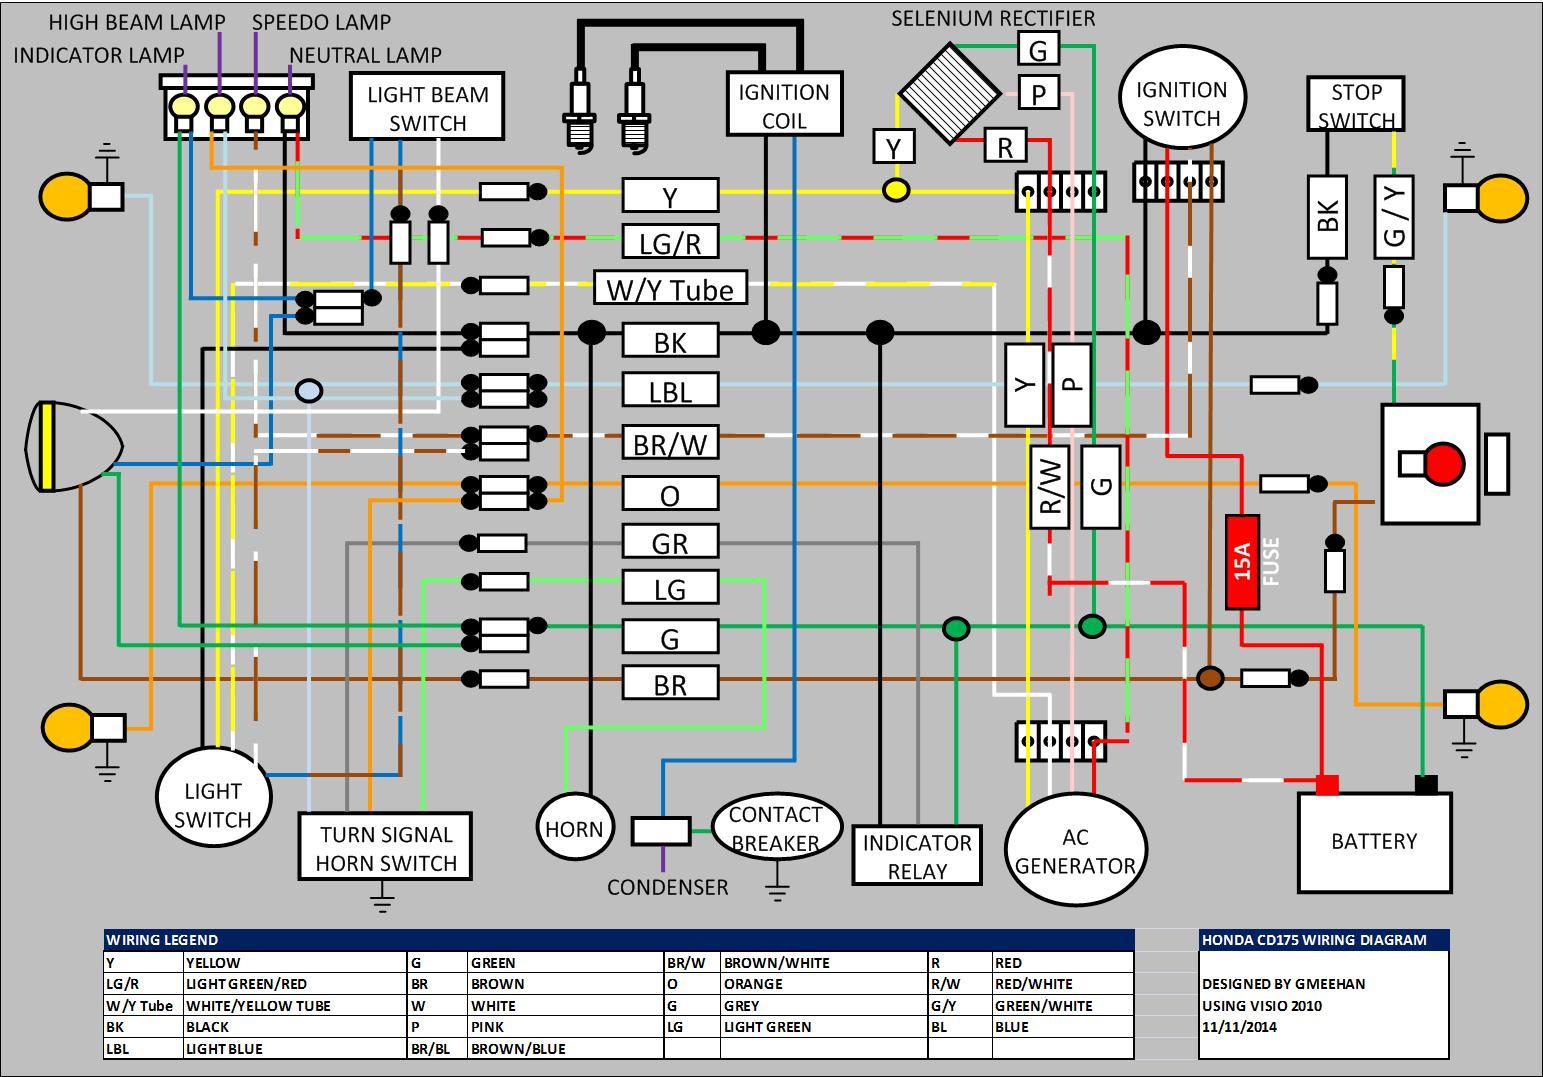 Honda Motorcycle Wiring | Wiring Diagram - Honda Motorcycle Wiring Diagram